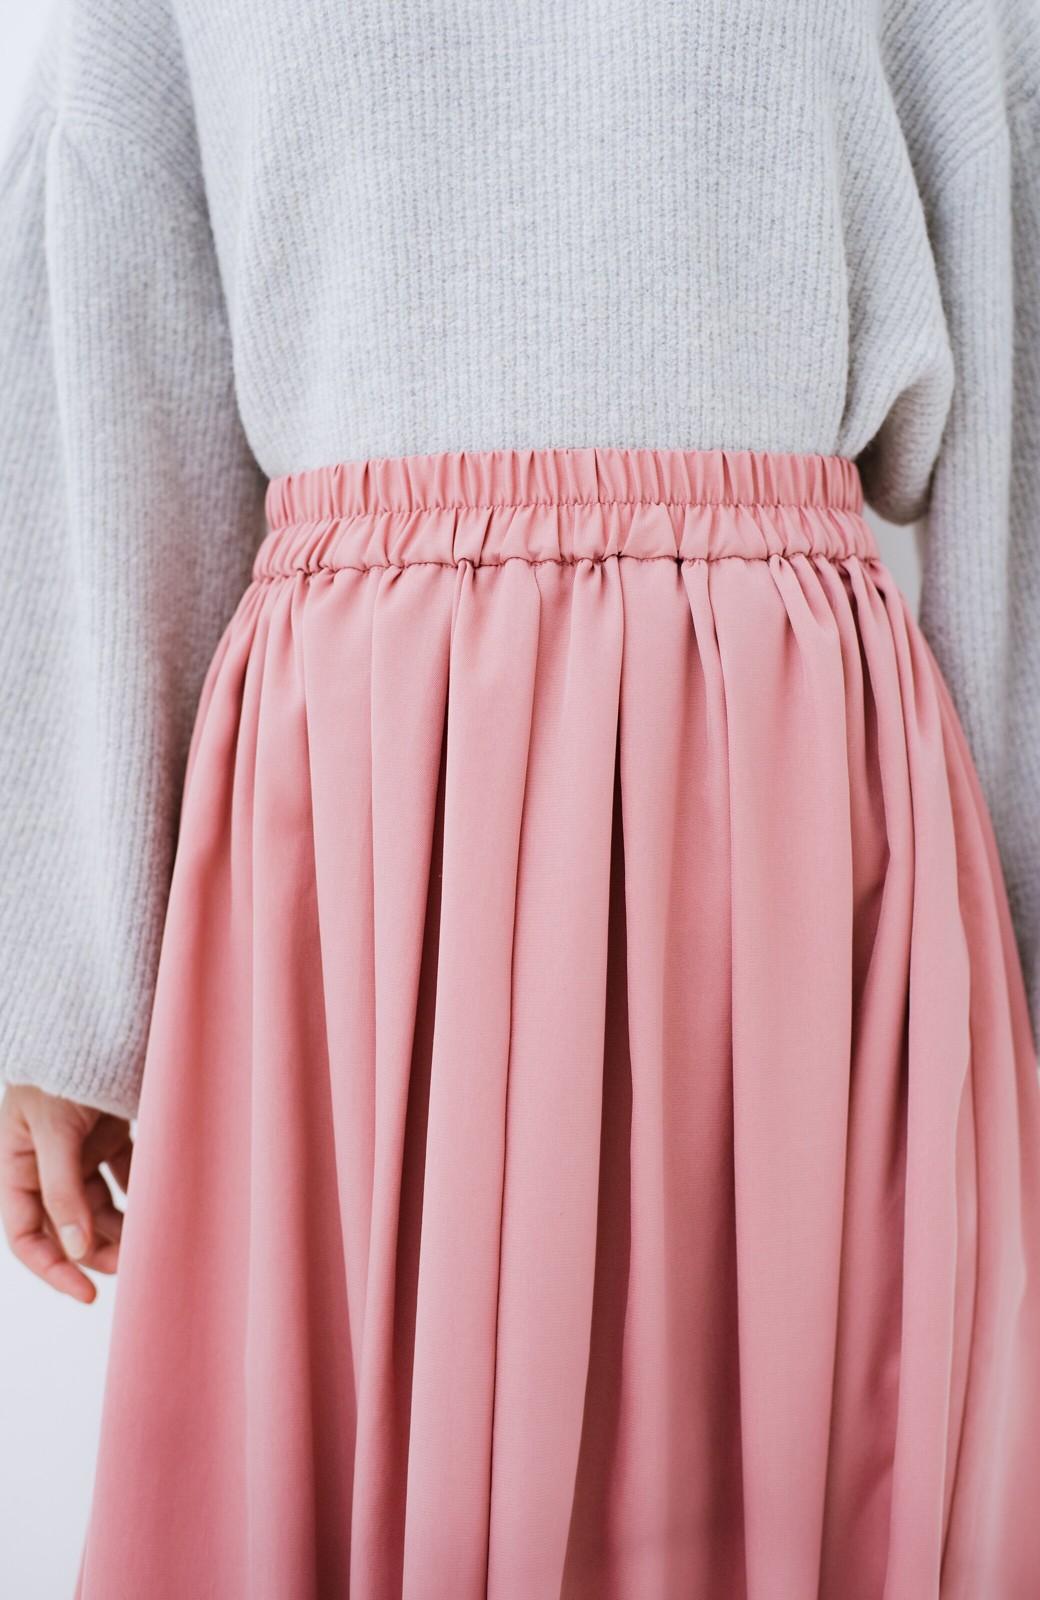 haco! きれいなお姉さんになれる気がするミモレ丈フレアースカート <ピンク>の商品写真7